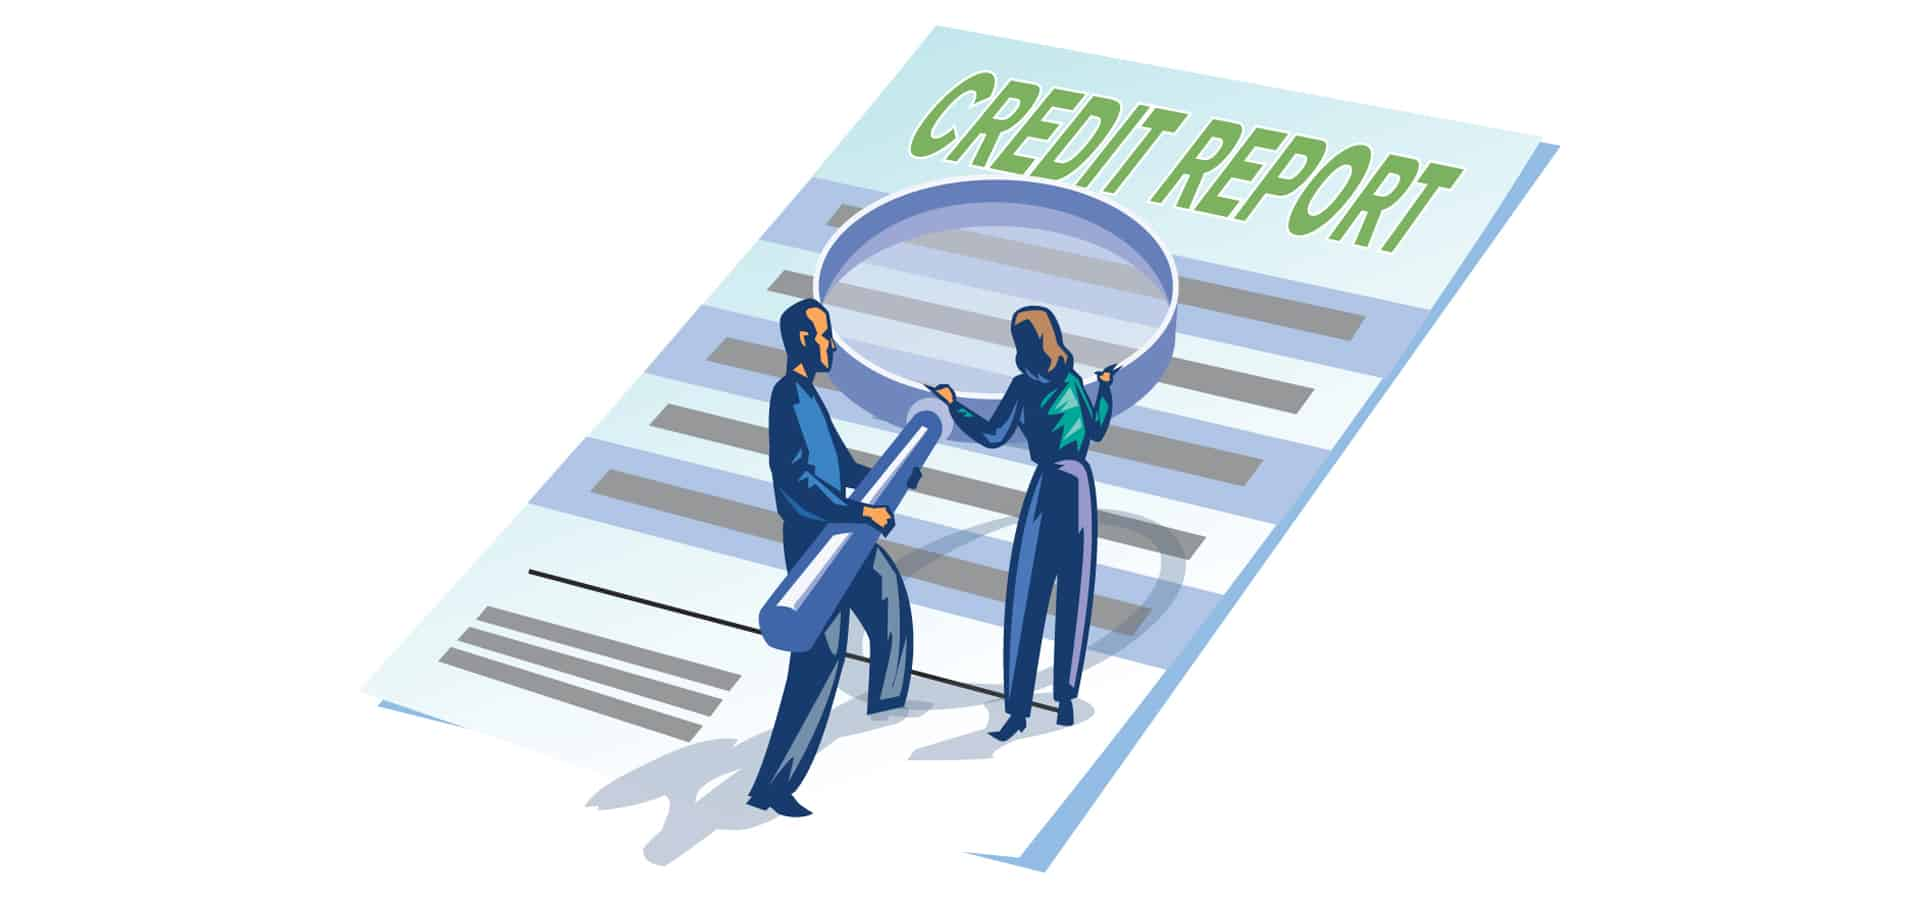 Credit Reporting Agency (CRA)